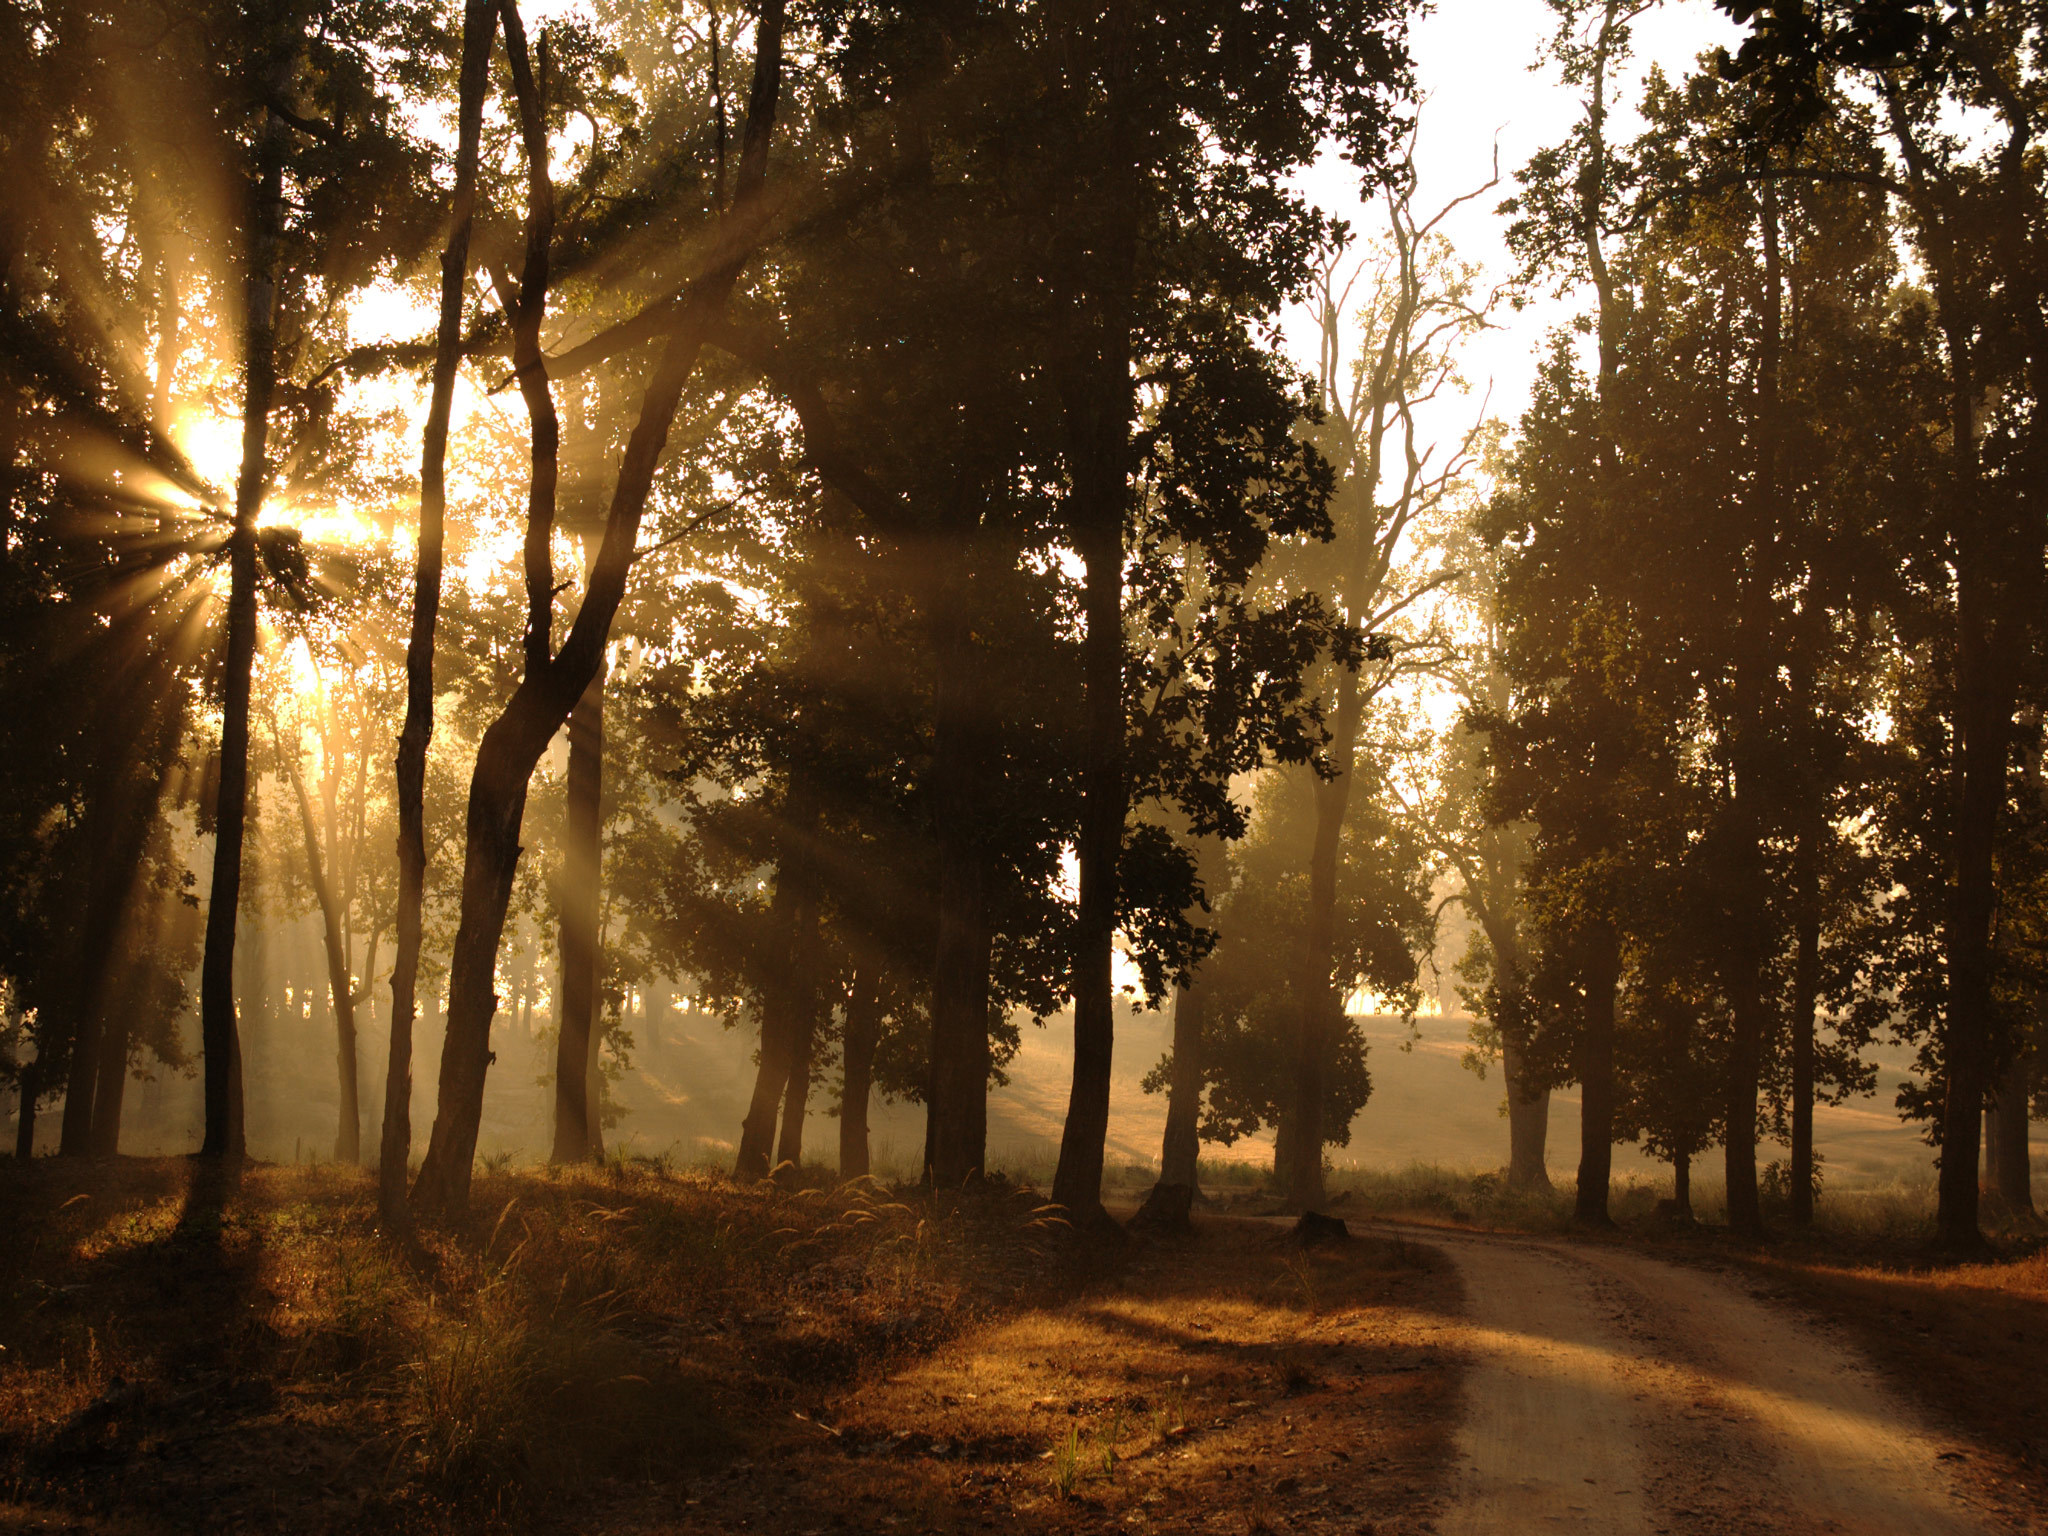 Sun peeps through the trees in Kanha wildlife reserve in Madhya Pradesh